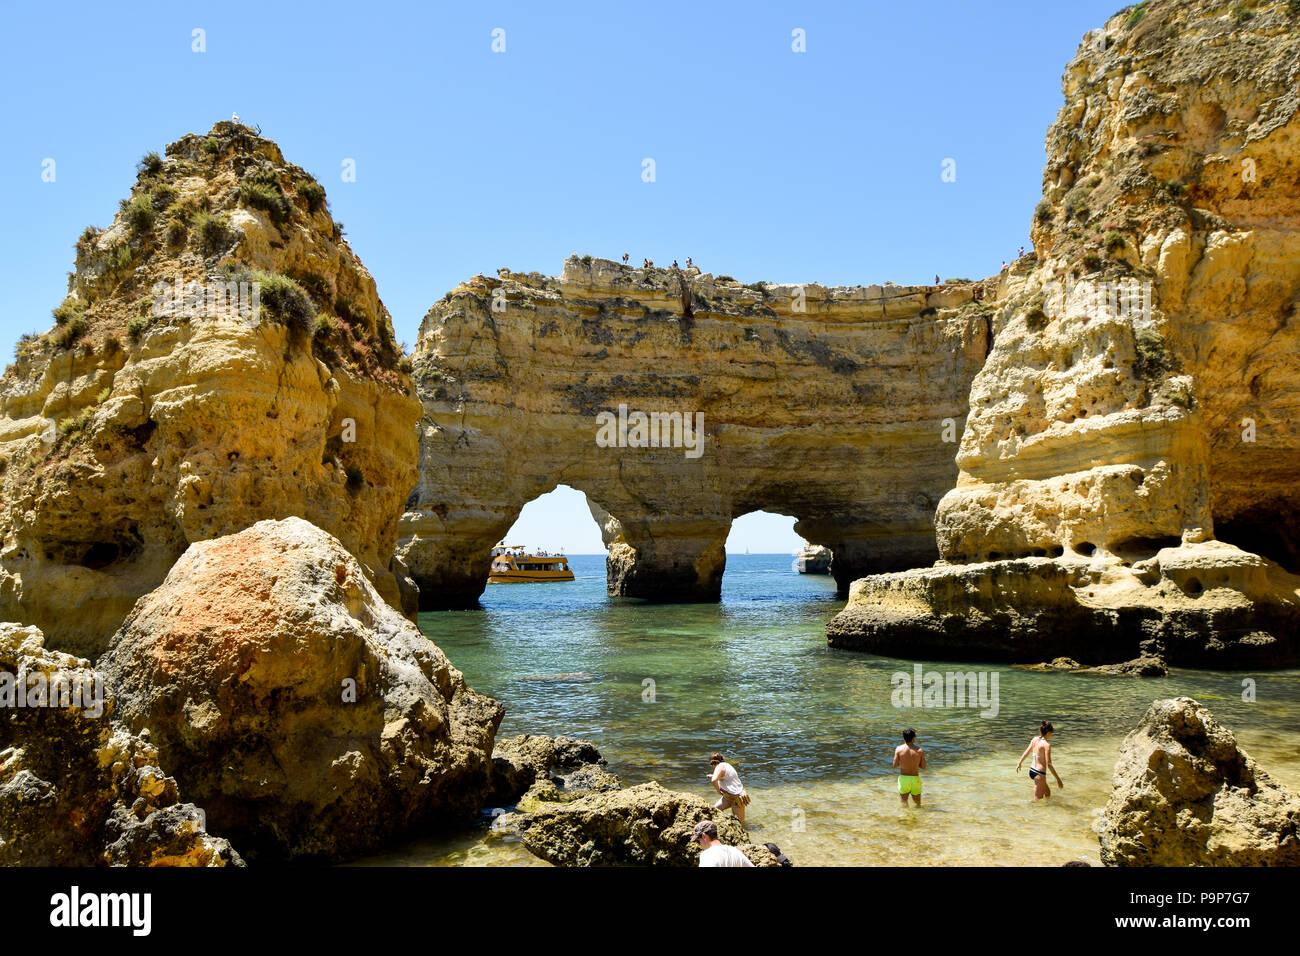 Marinha beach in Porches, Algarve, Portugal - Stock Image